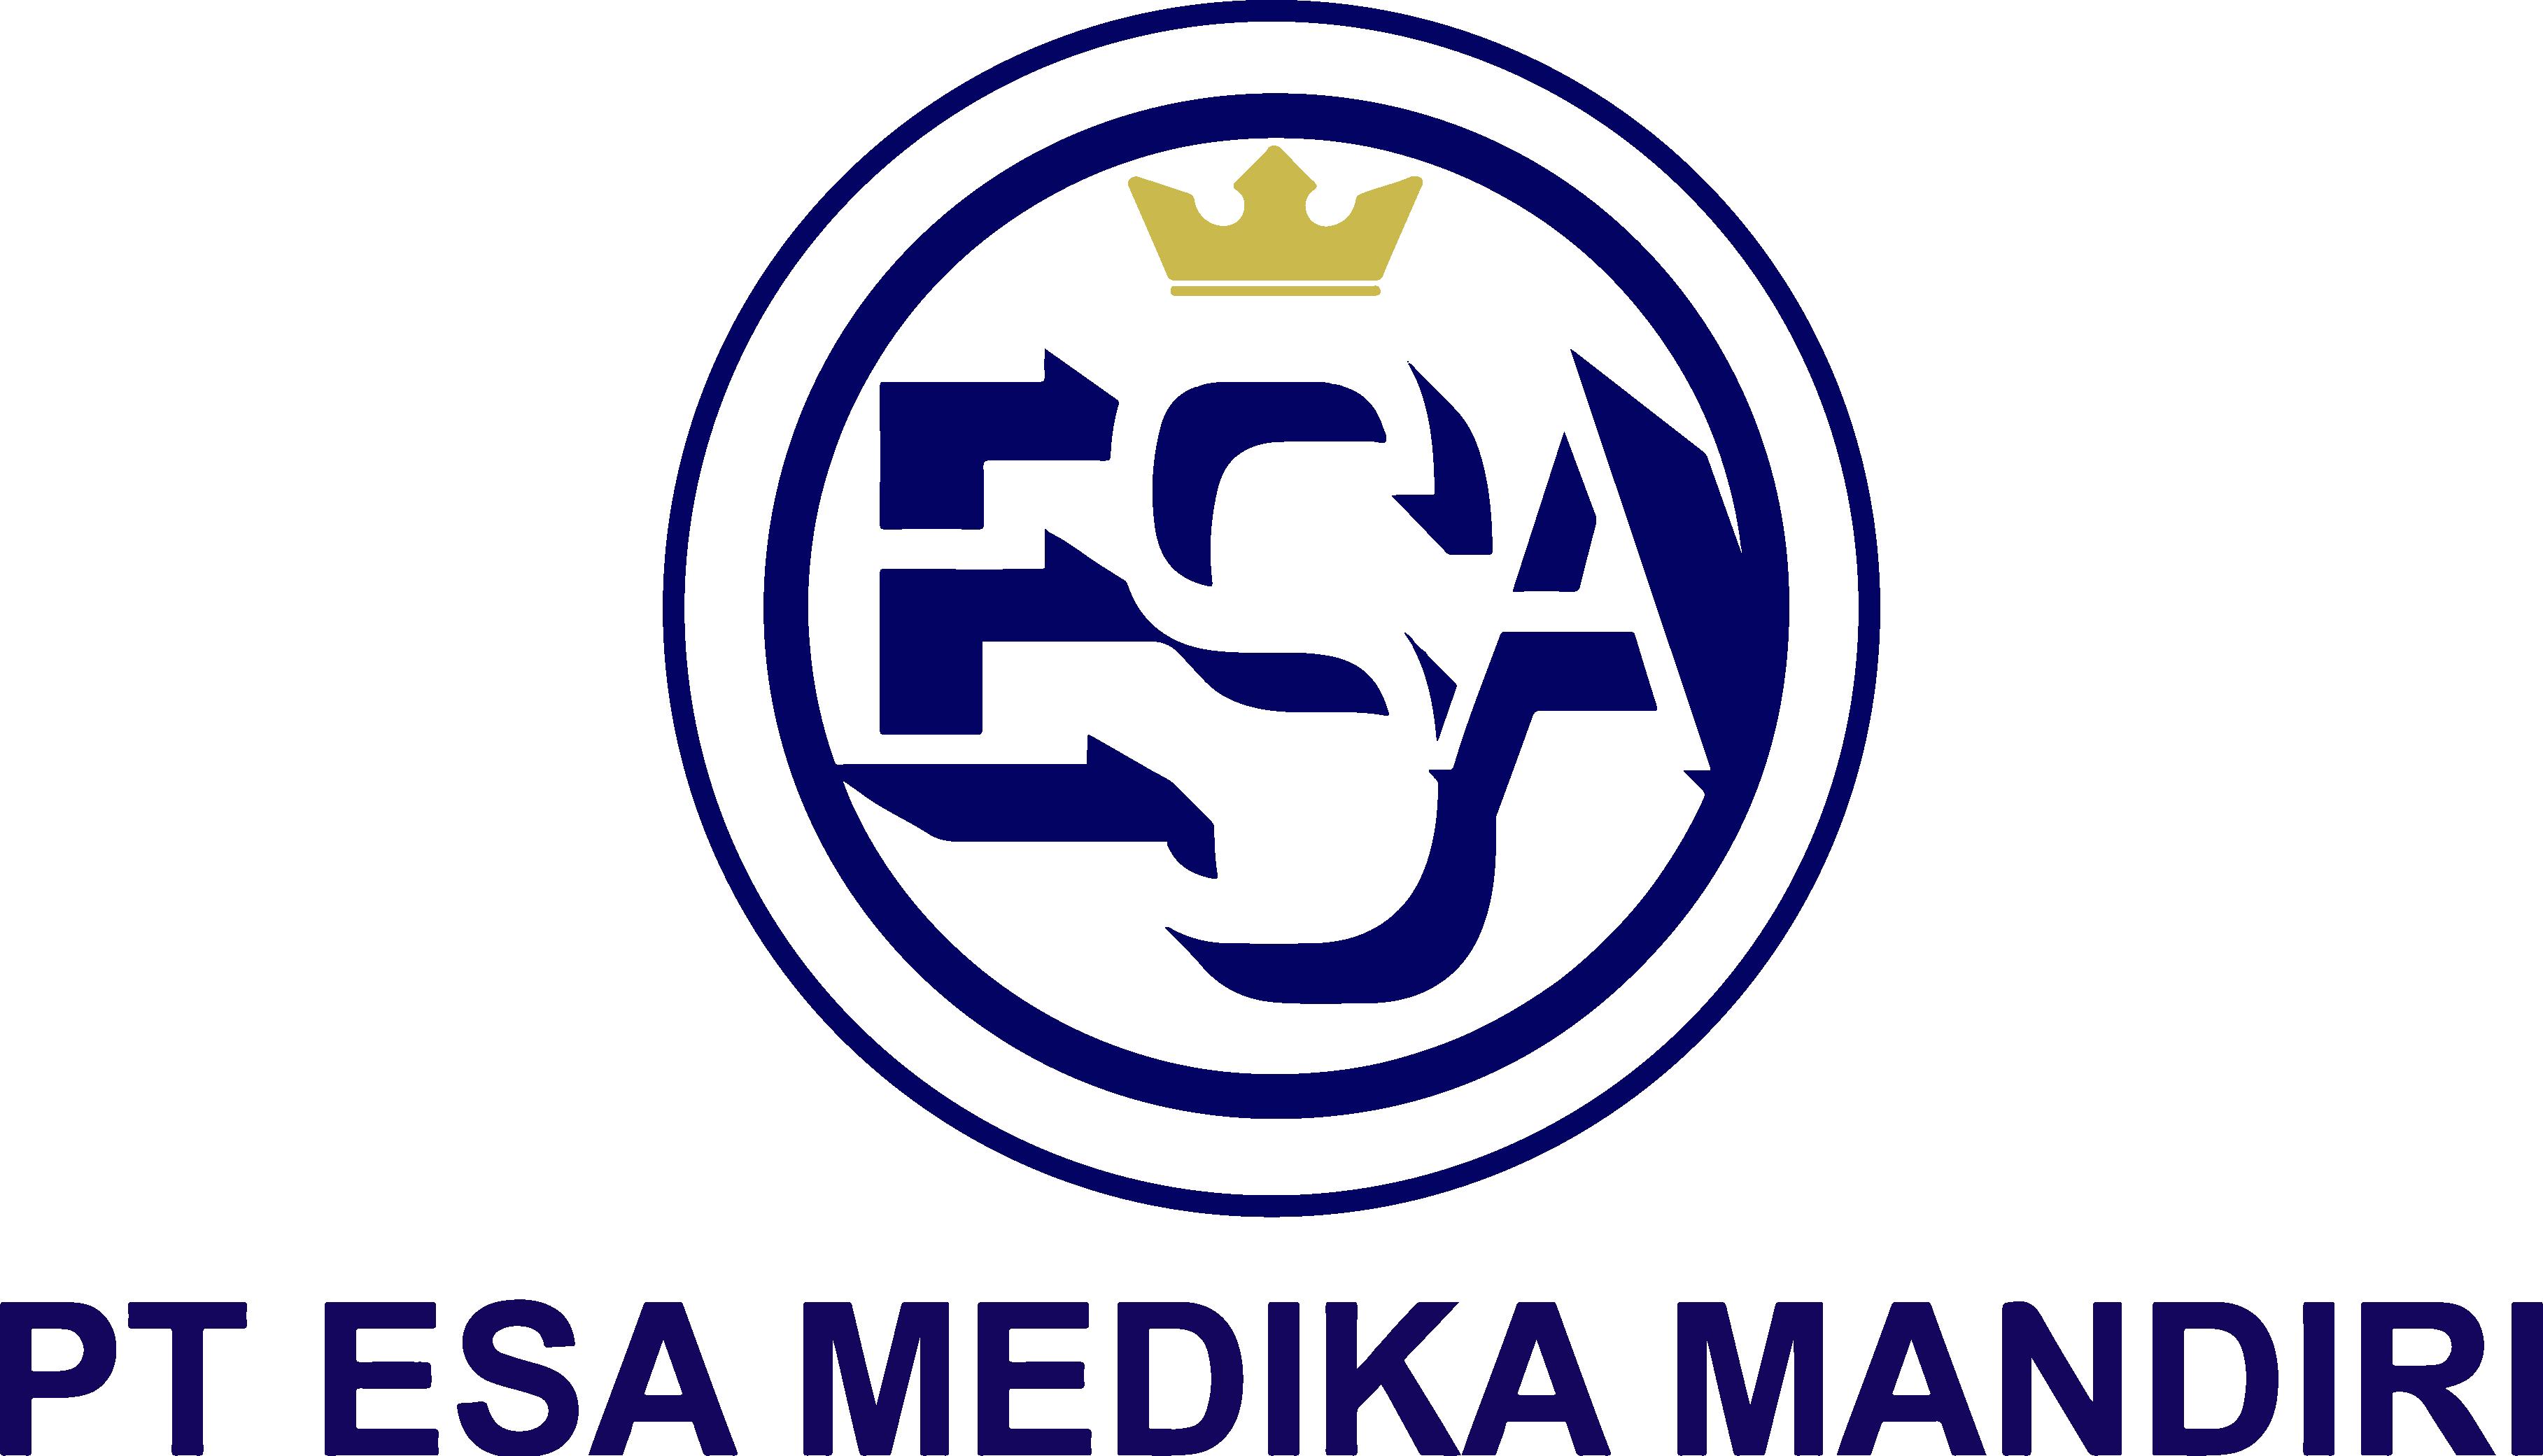 PT ESA MEDIKA MANDIRI